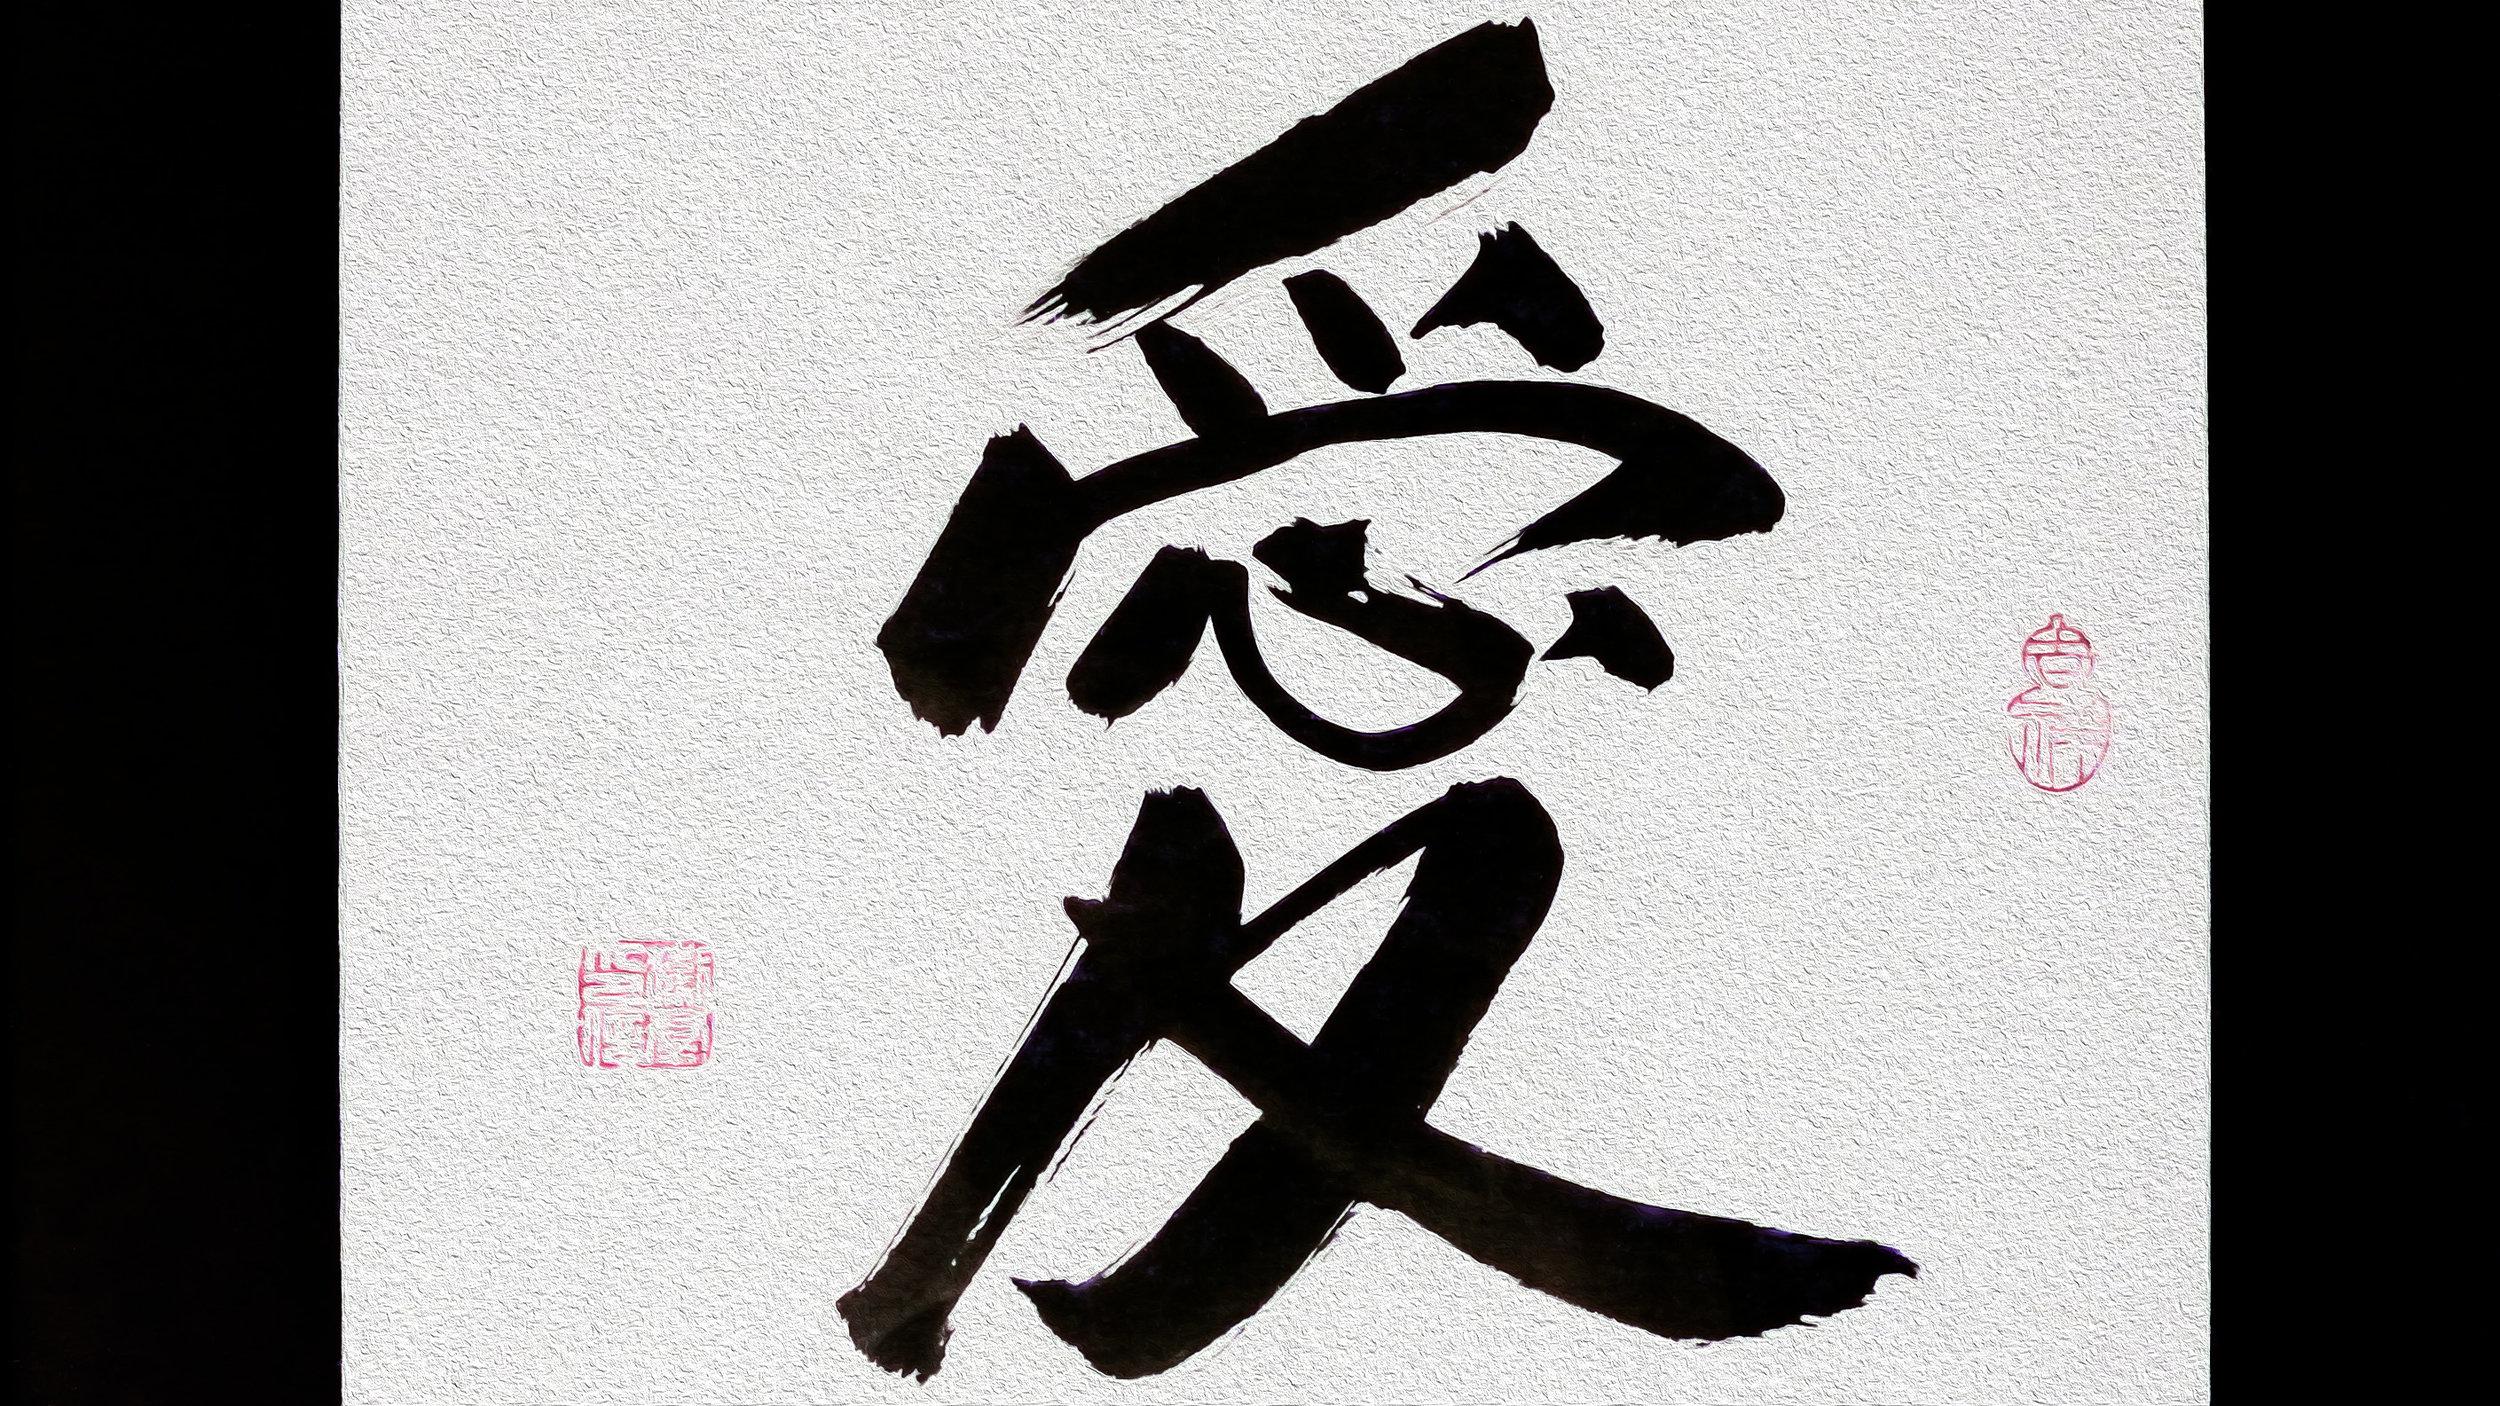 symbol-1070390.jpg